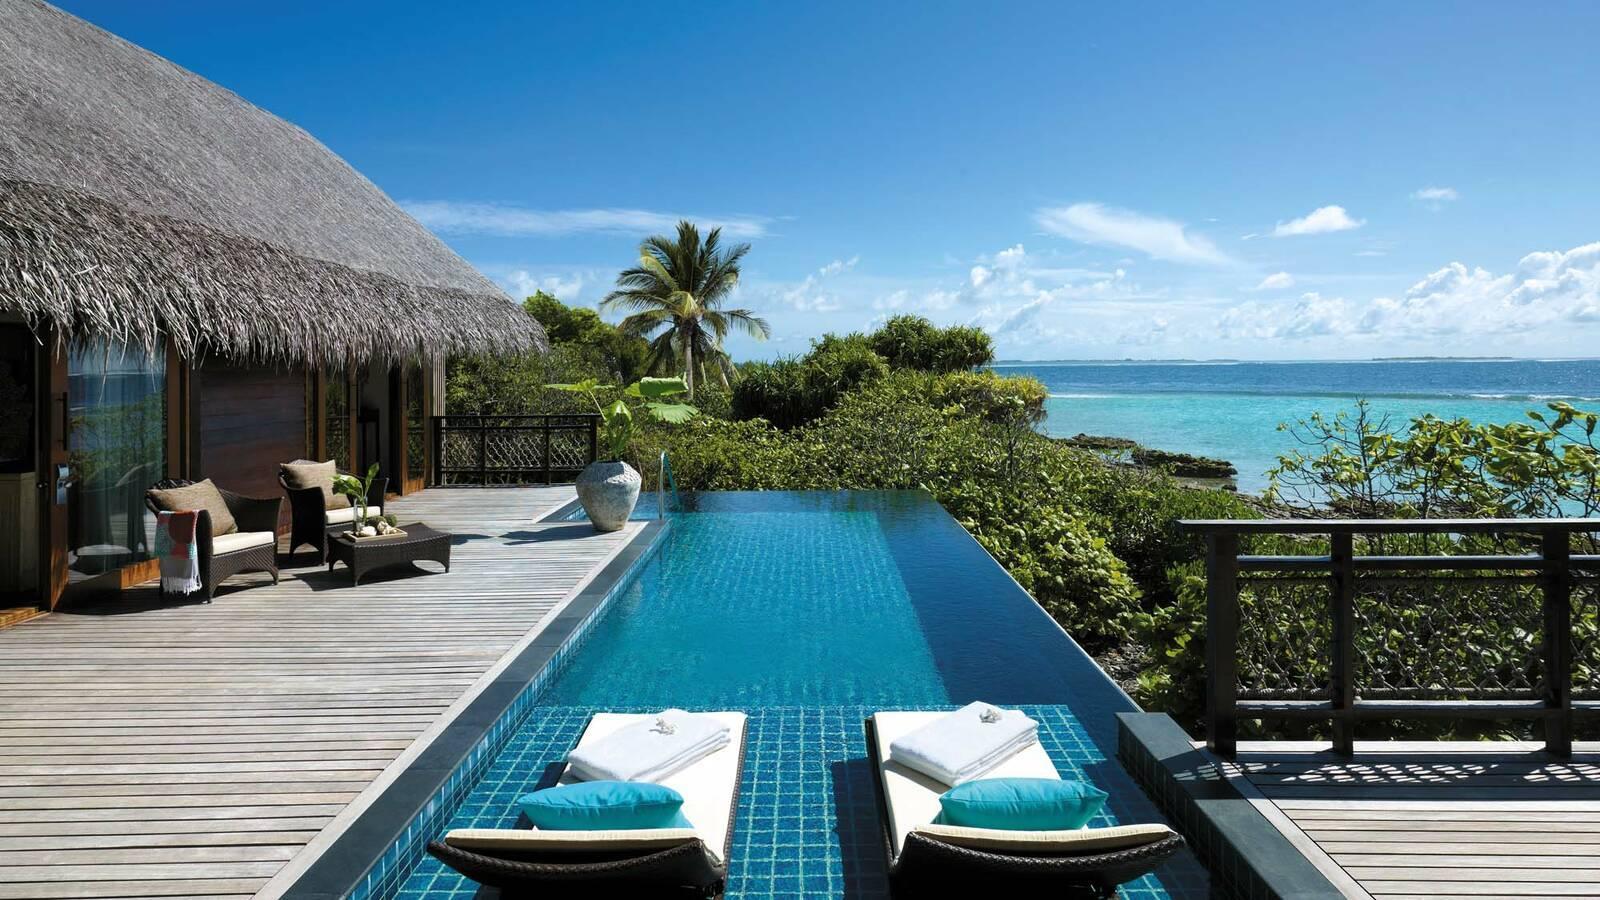 Shangri La Villingili Tree House Villa Piscine Maldives